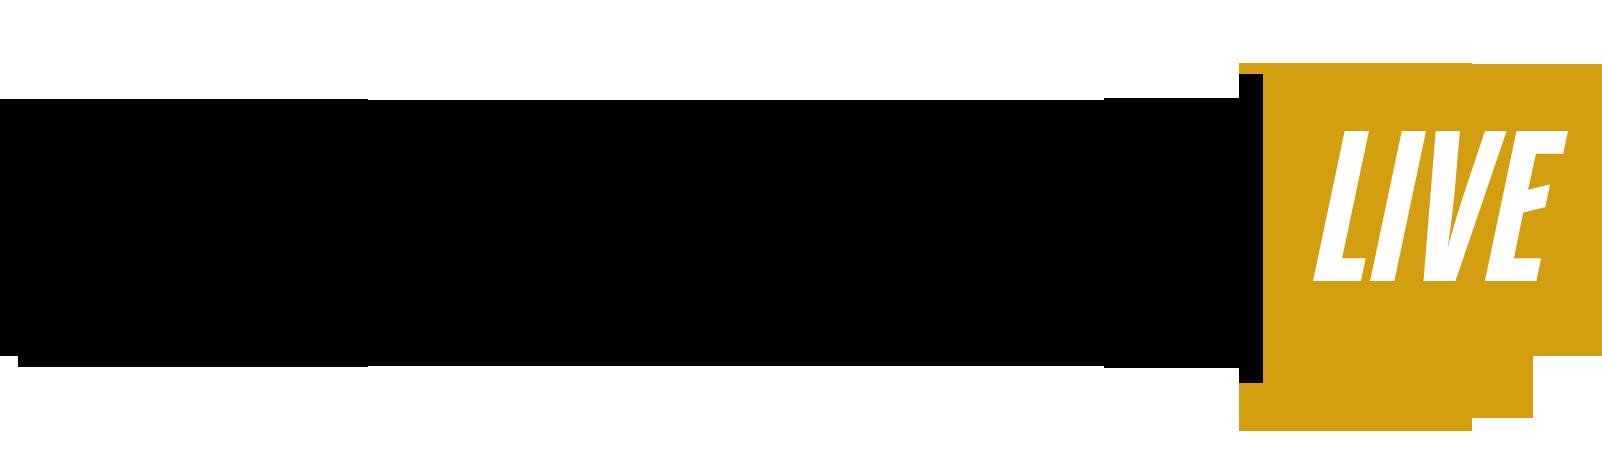 image - guitar hero live logo horiz rgb | wikihero | fandom